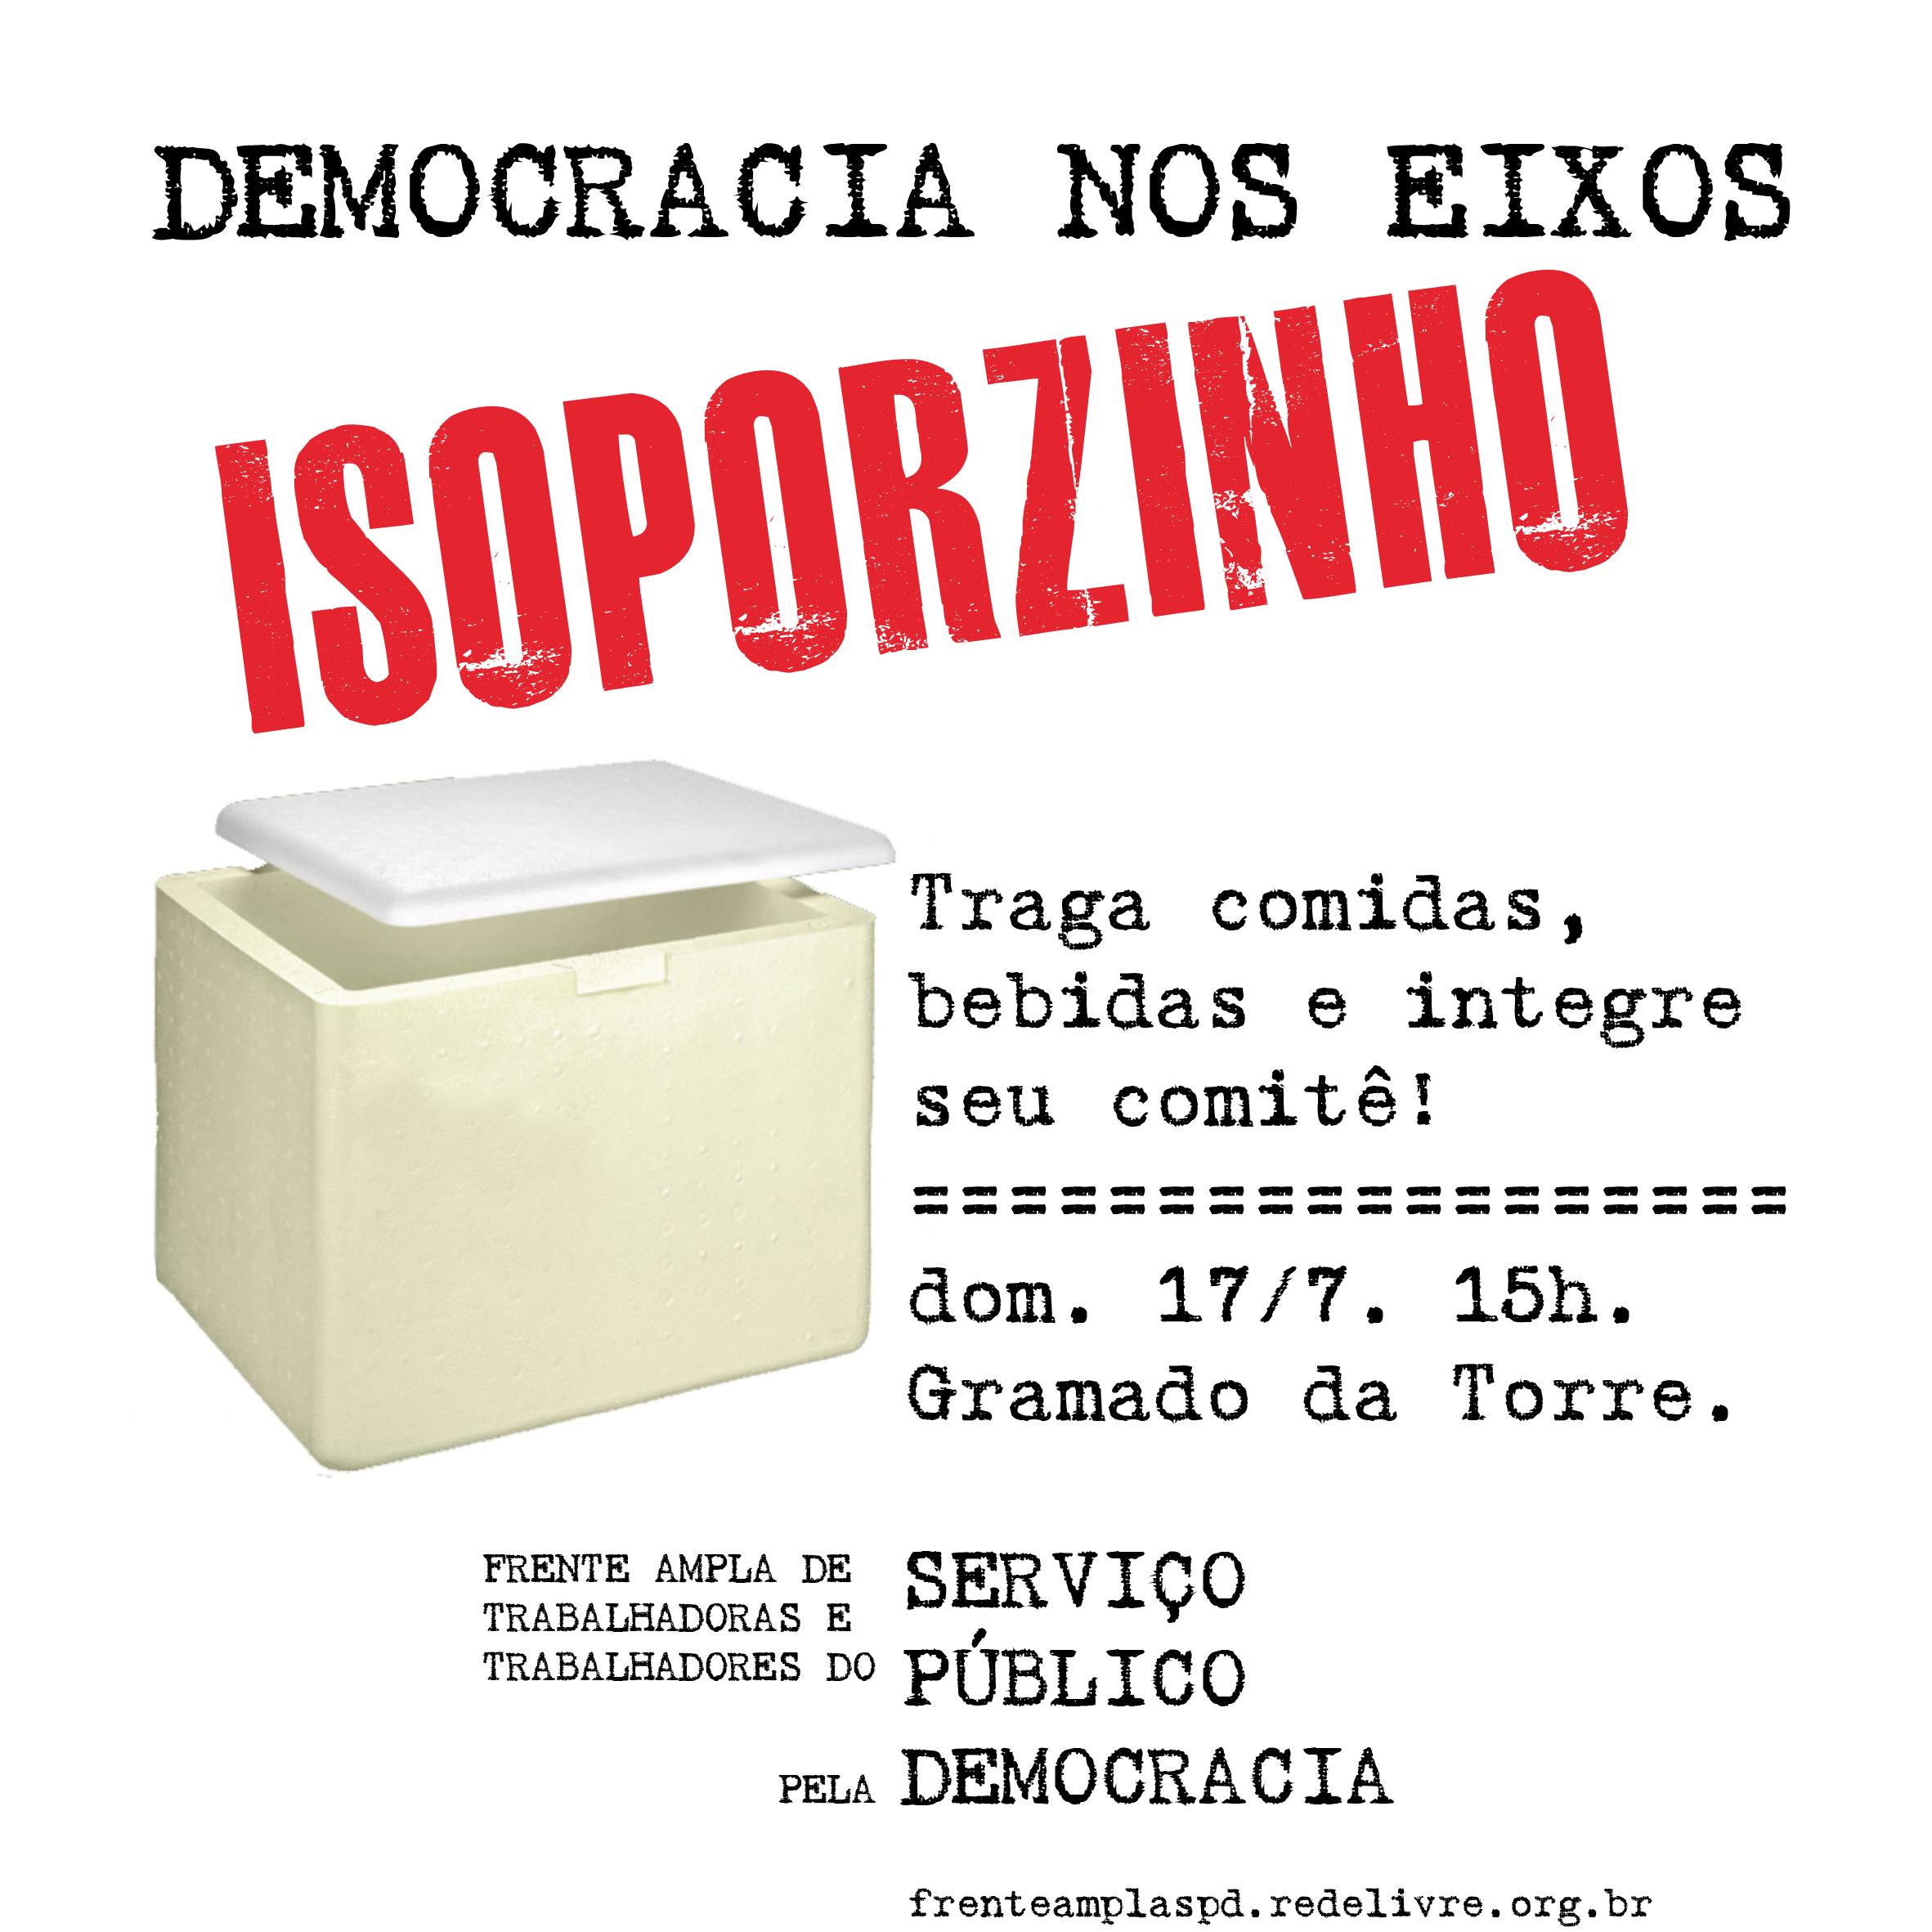 spd-isoporzinho-160717